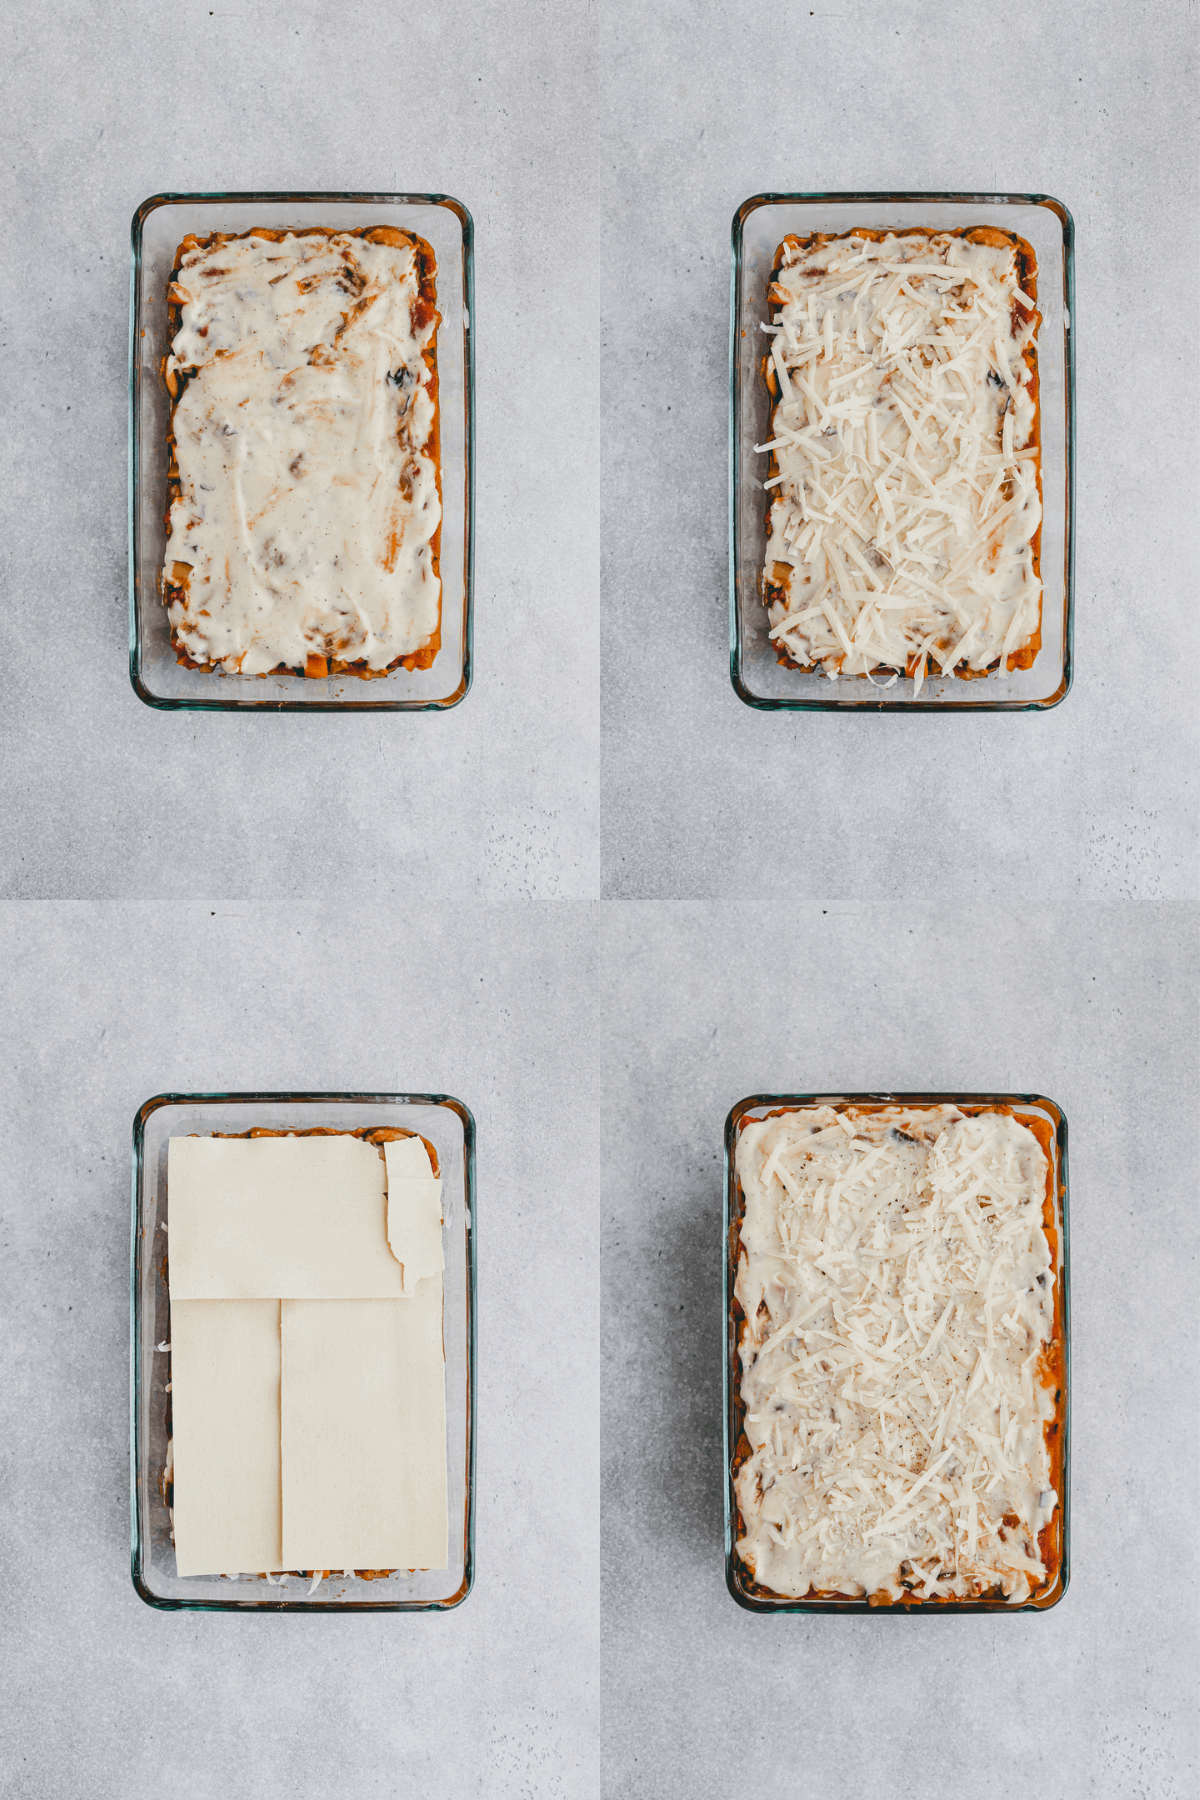 Layer Lasagna Recipe Step 10-13